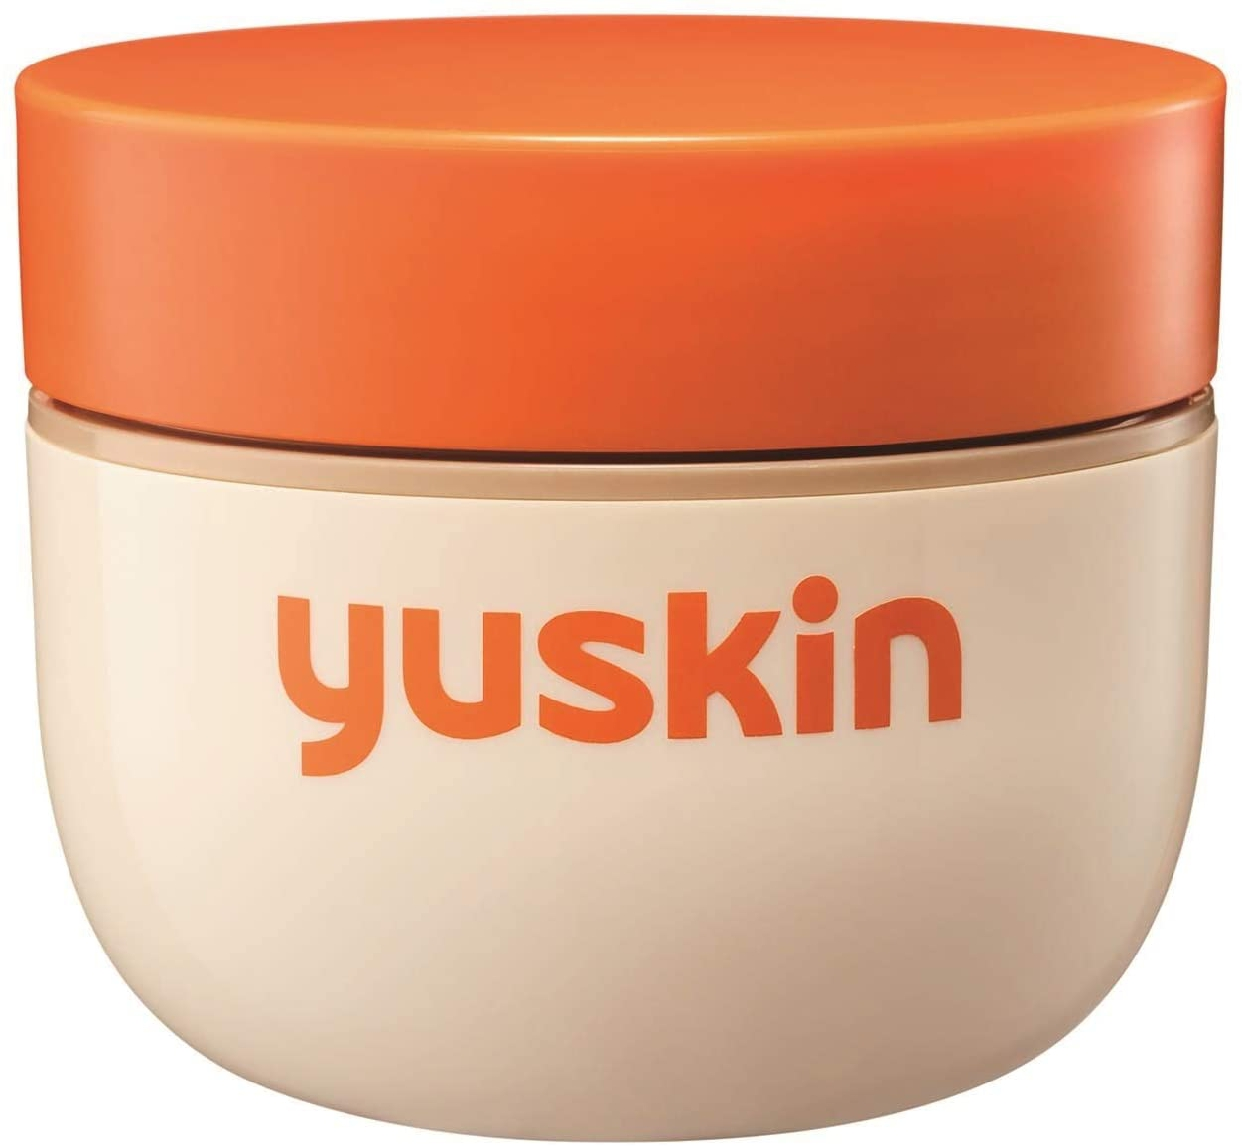 yuskin(ユースキン) ユースキンの商品画像2